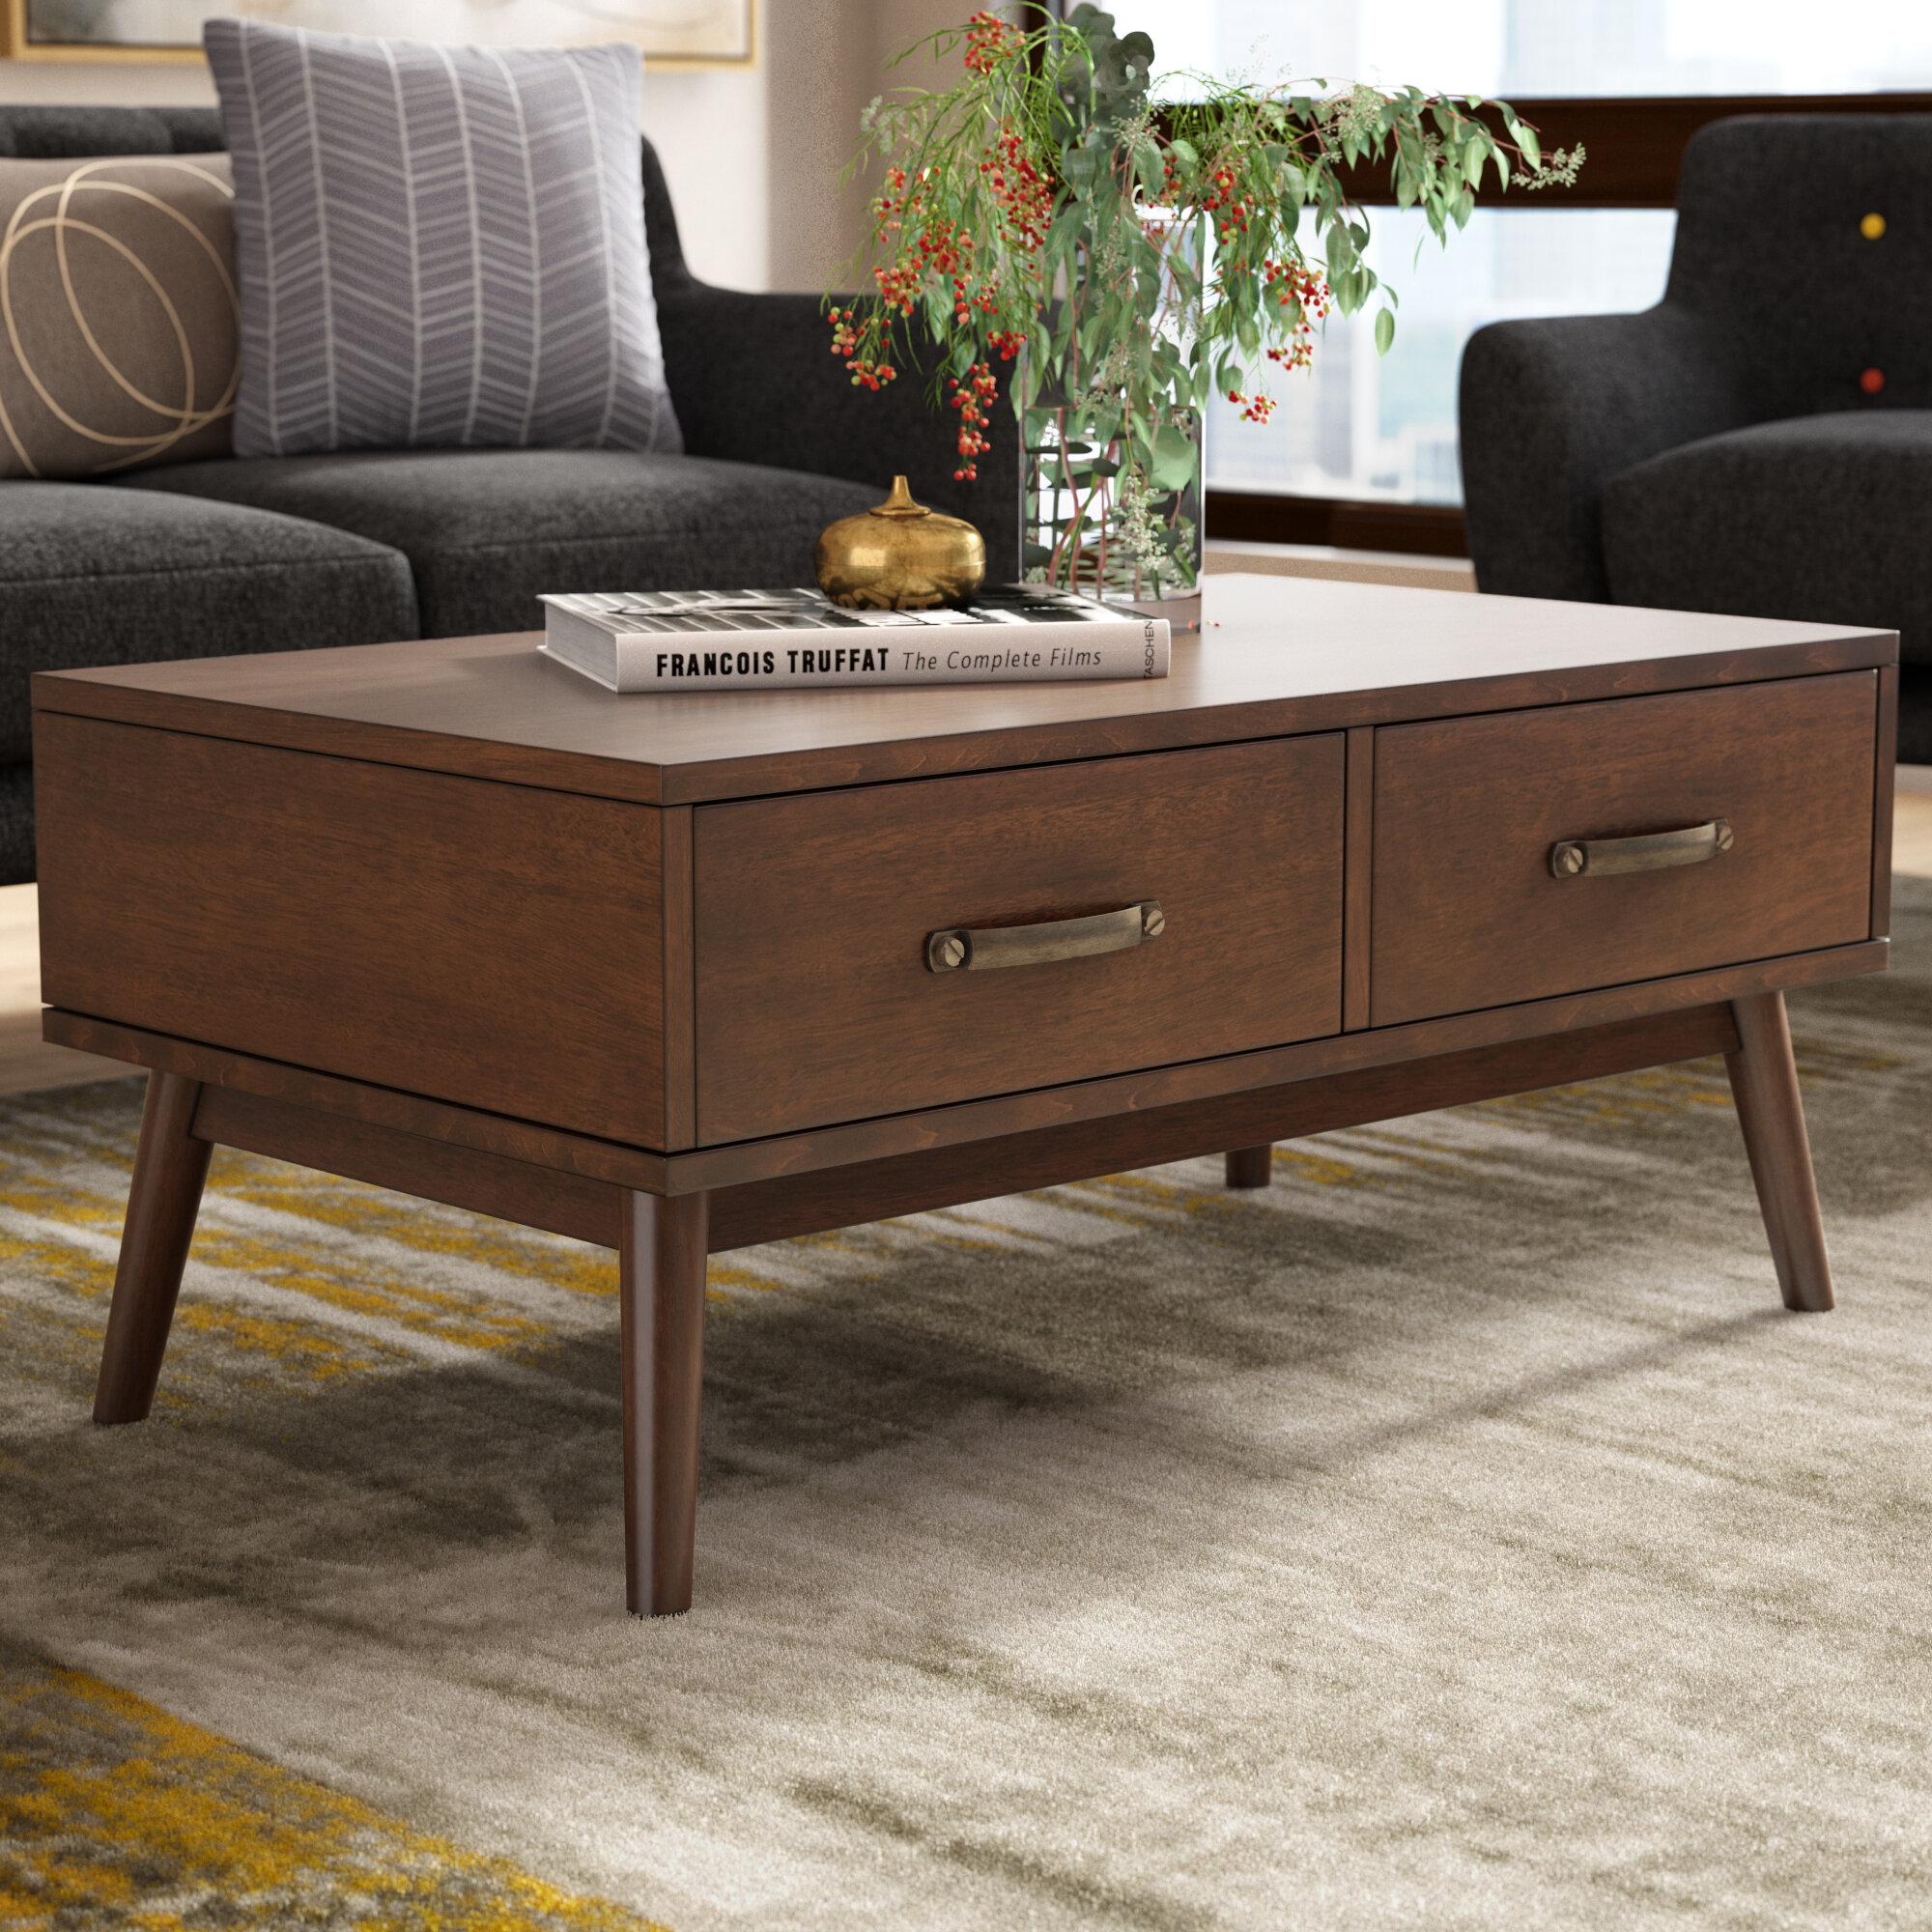 Charmant Morris Mid Century Modern Coffee Table